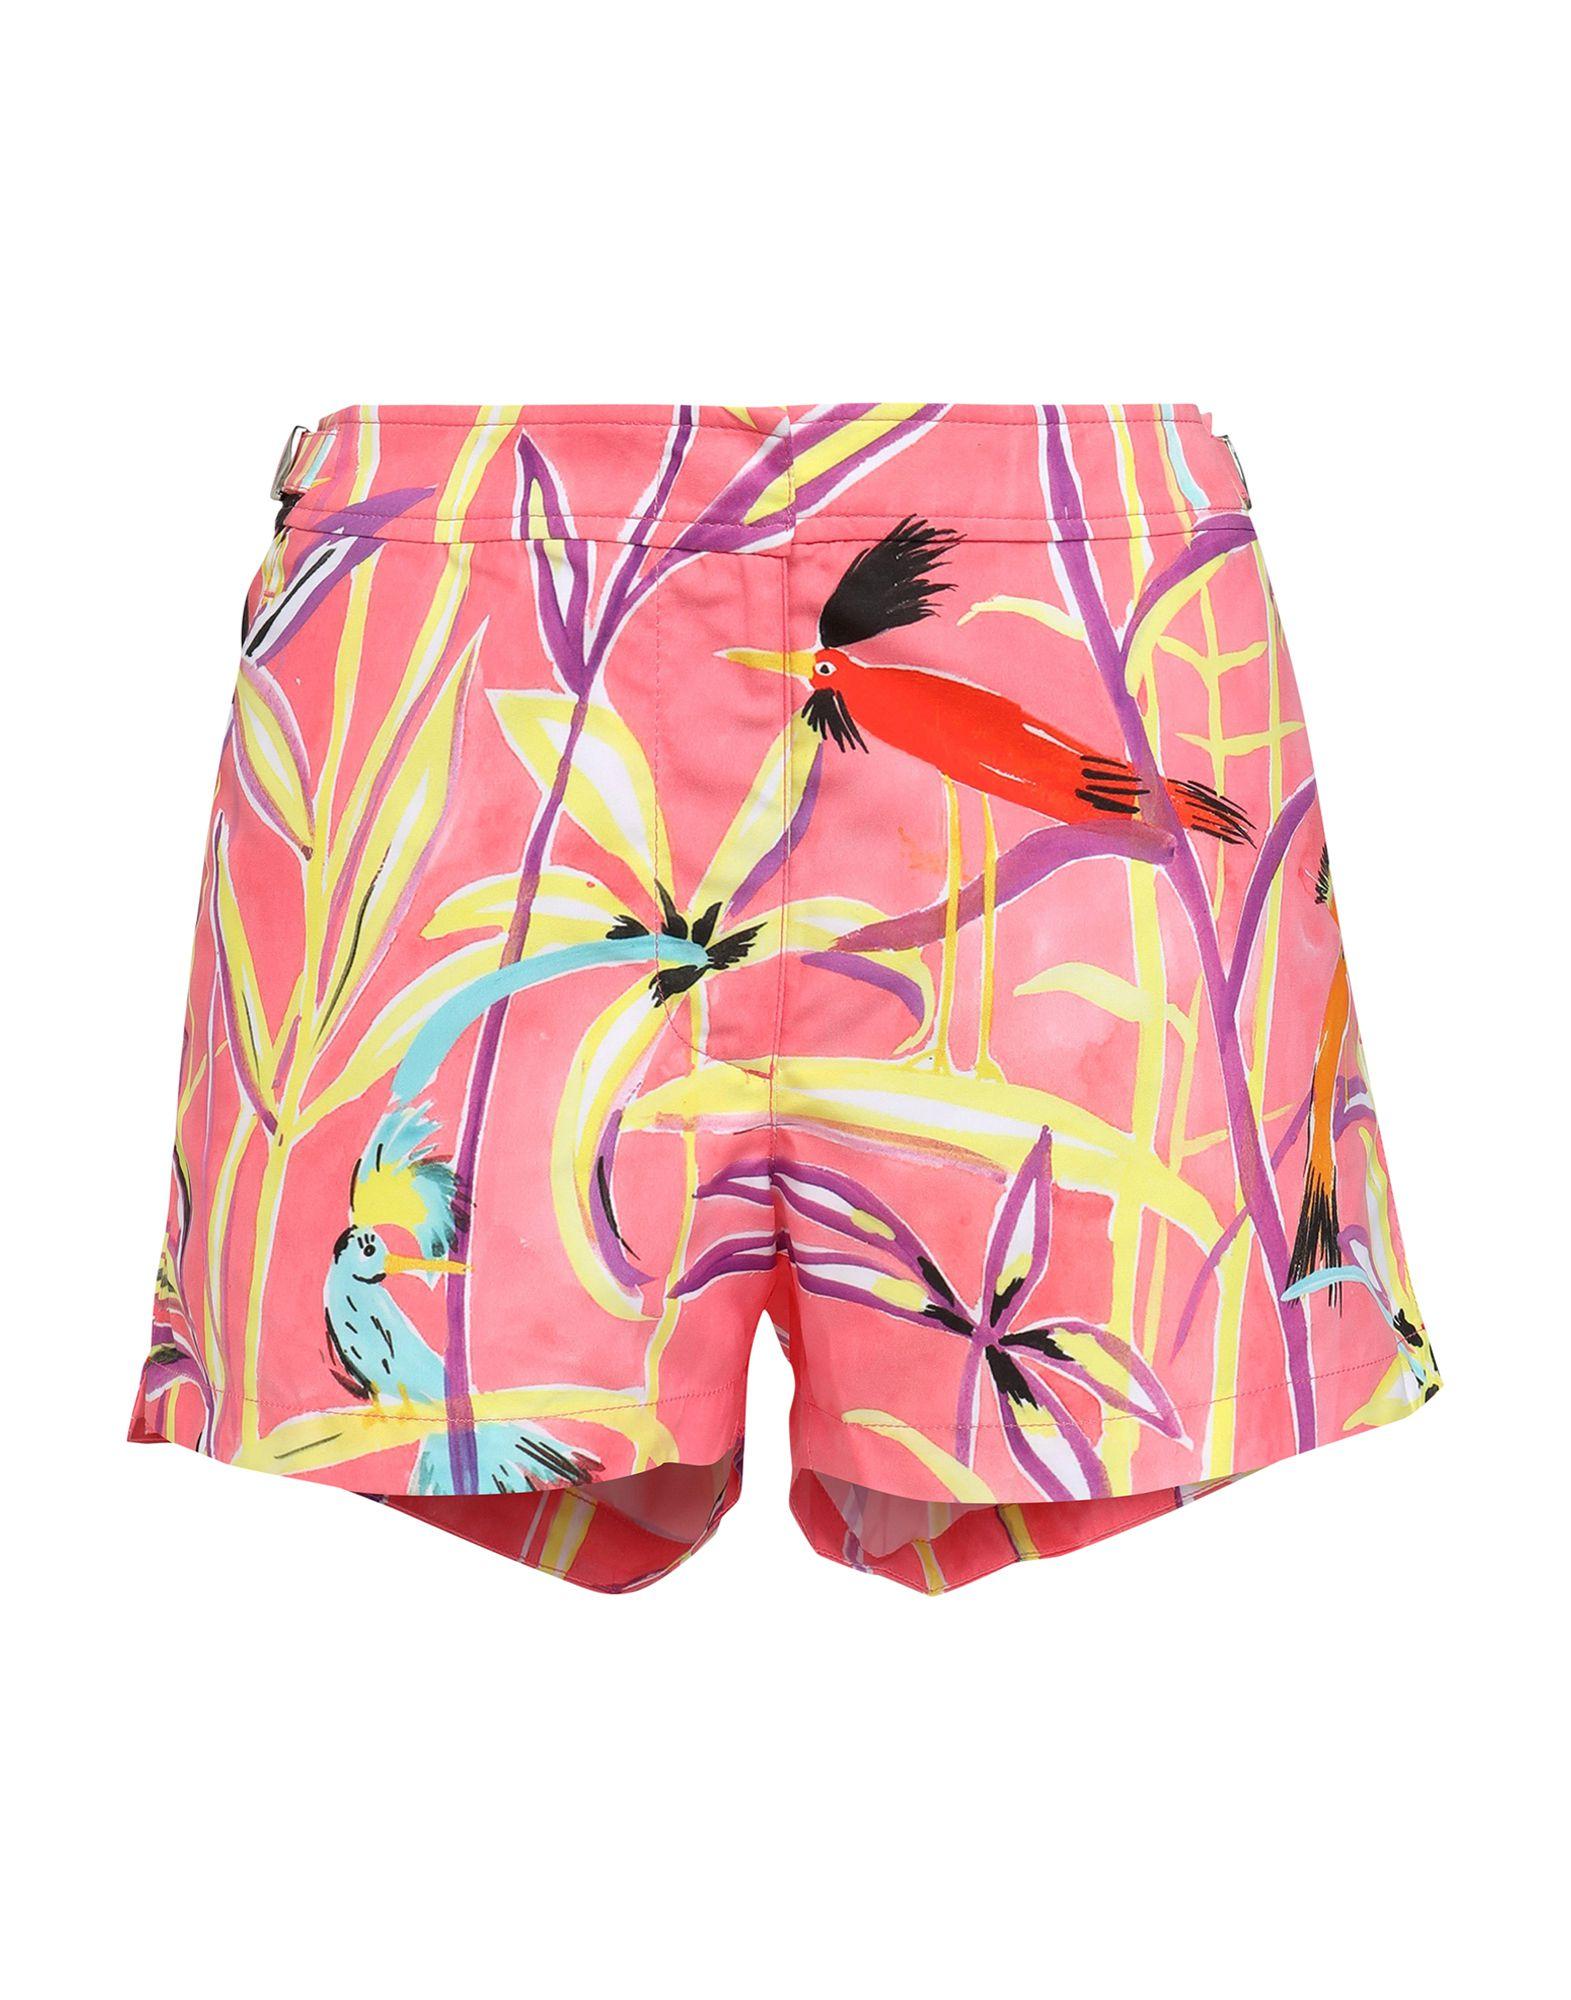 ORLEBAR BROWN Пляжные брюки и шорты adidas пляжные брюки и шорты